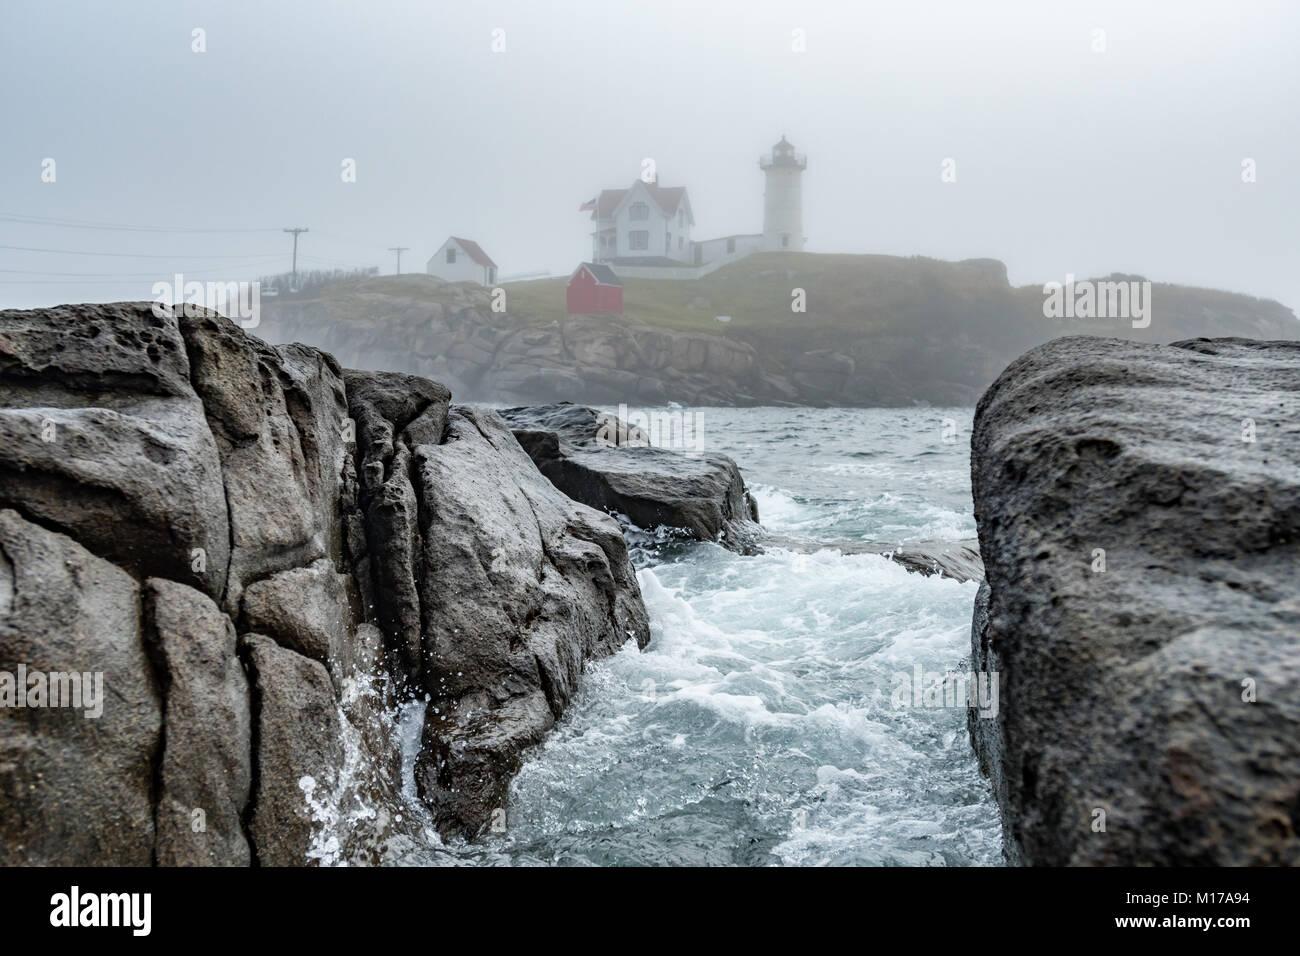 Water Rushes Through Rocks at Cape Neddick Lighthouse along Maine's coast - Stock Image